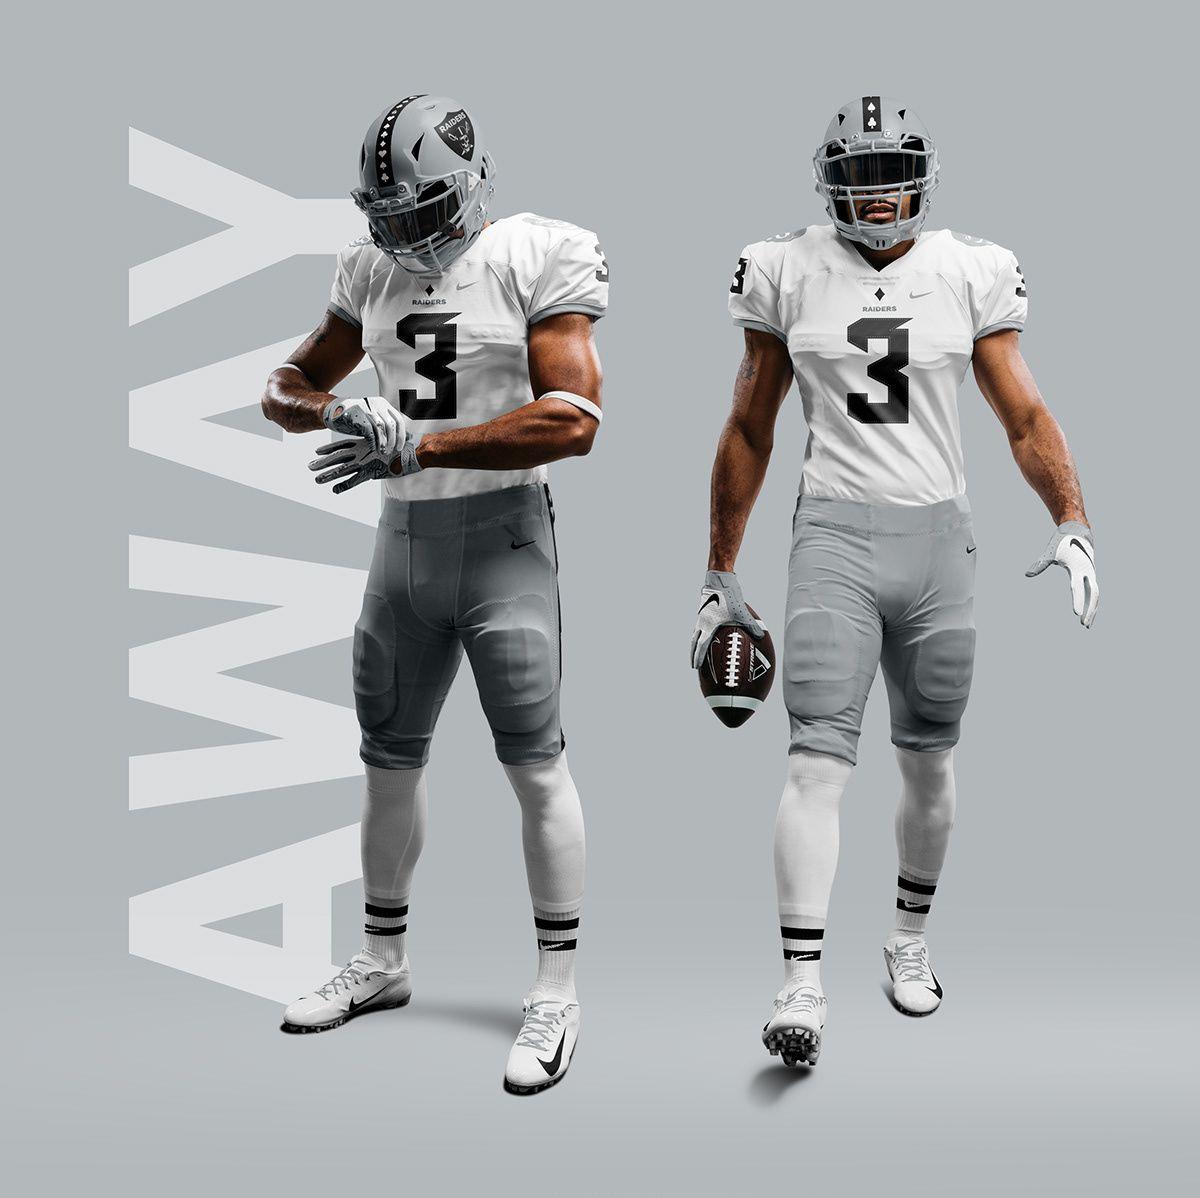 48+ Raiders uniform ideas in 2021